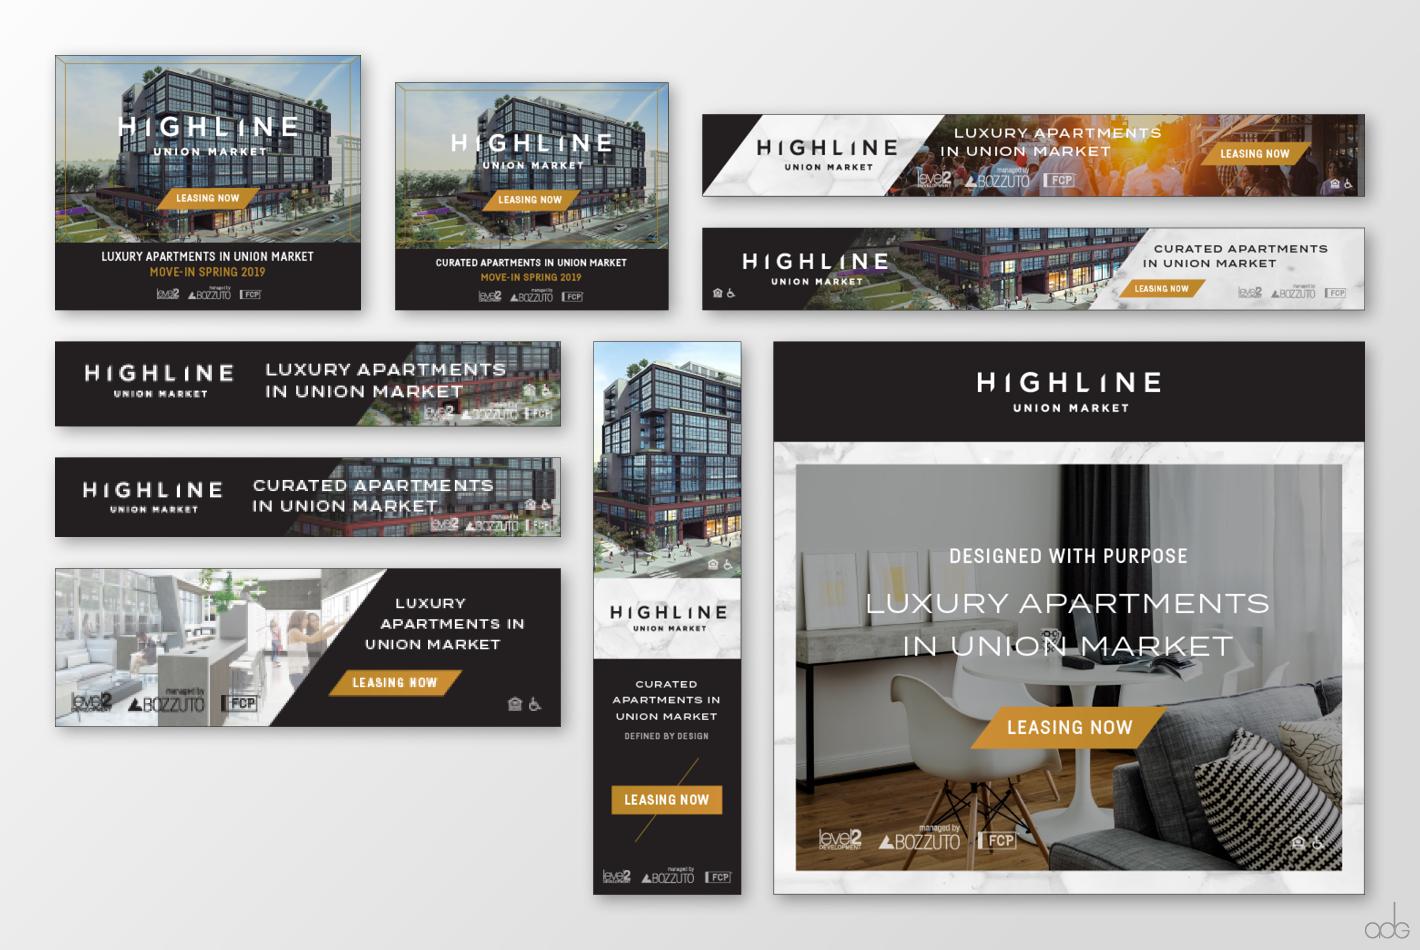 _AkseizerDesignGroup_Highline_15.jpg